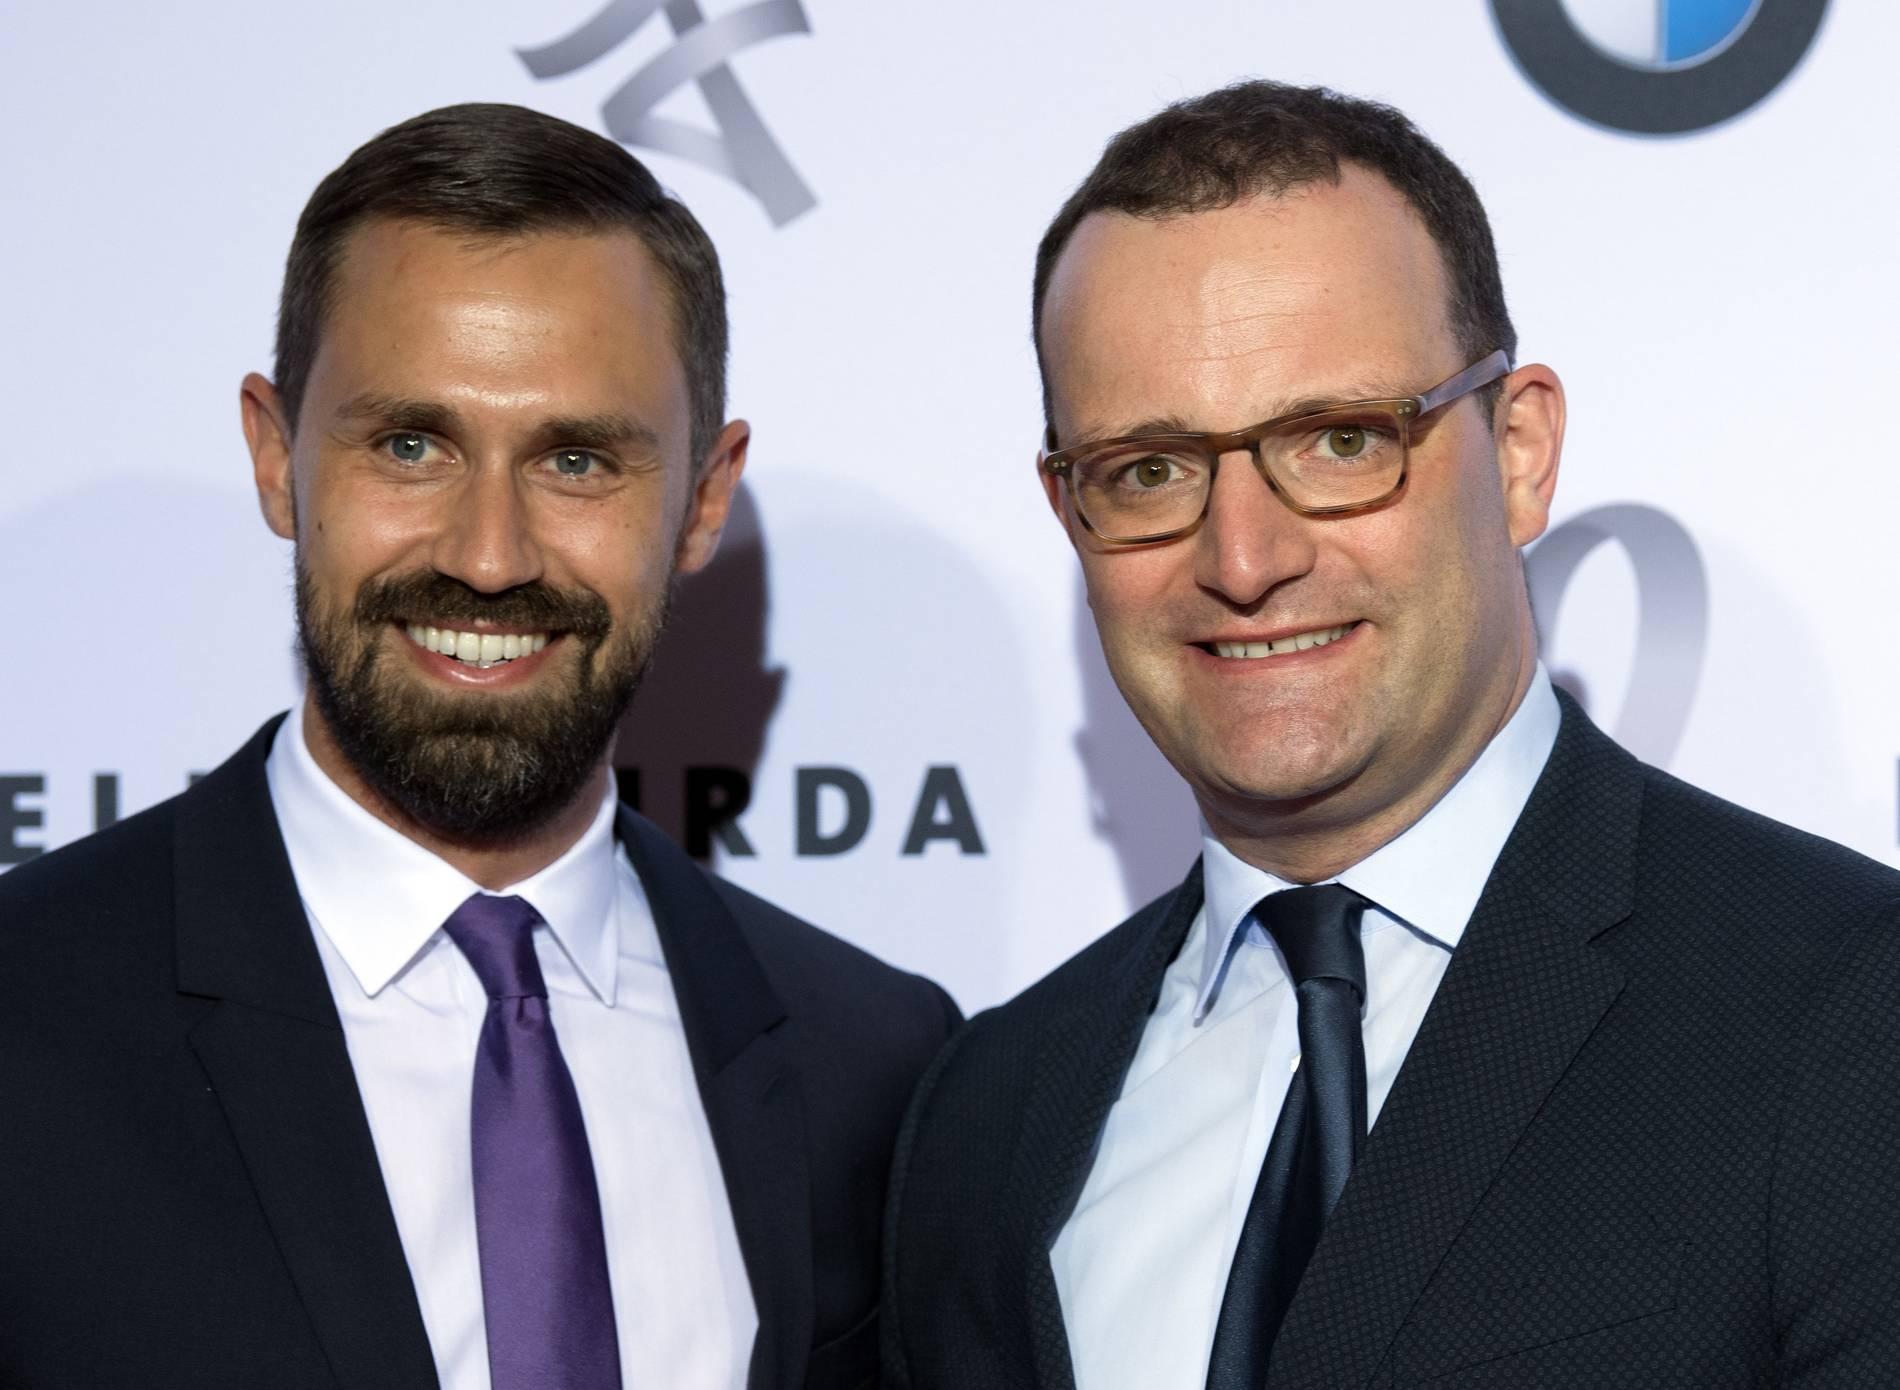 Corona: Auch Ehemann von Jens Spahn Daniel Funke infiziert